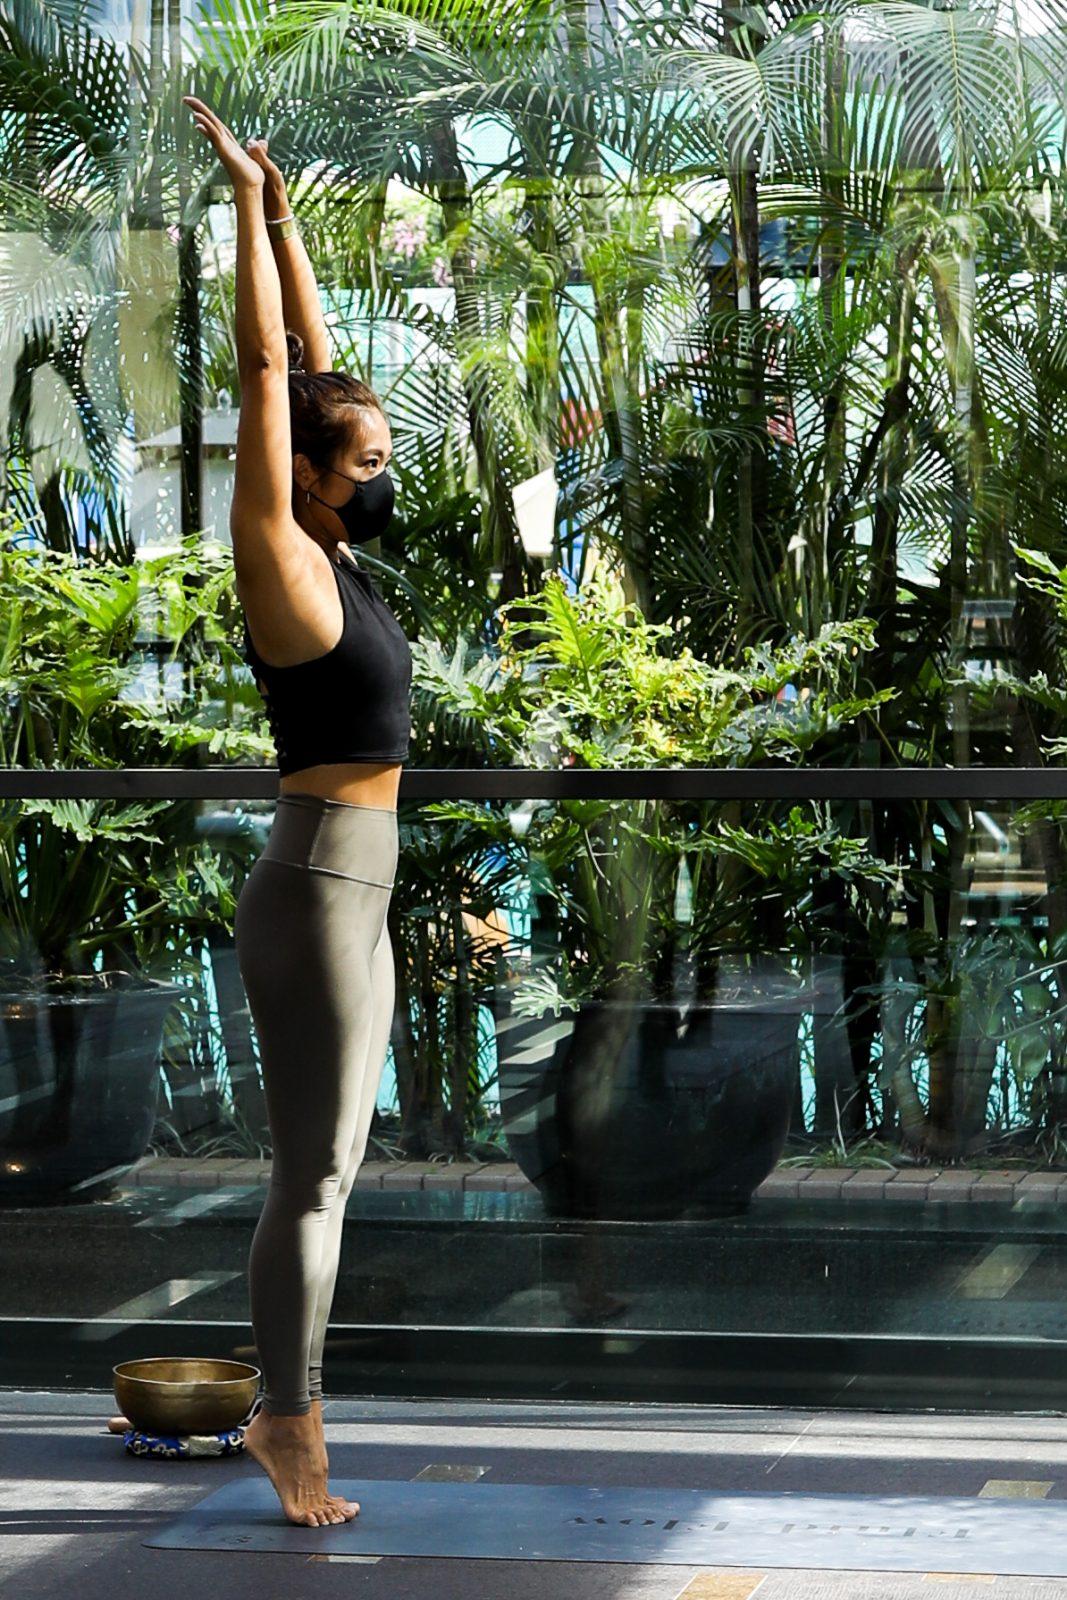 stelle mak yoga instructor